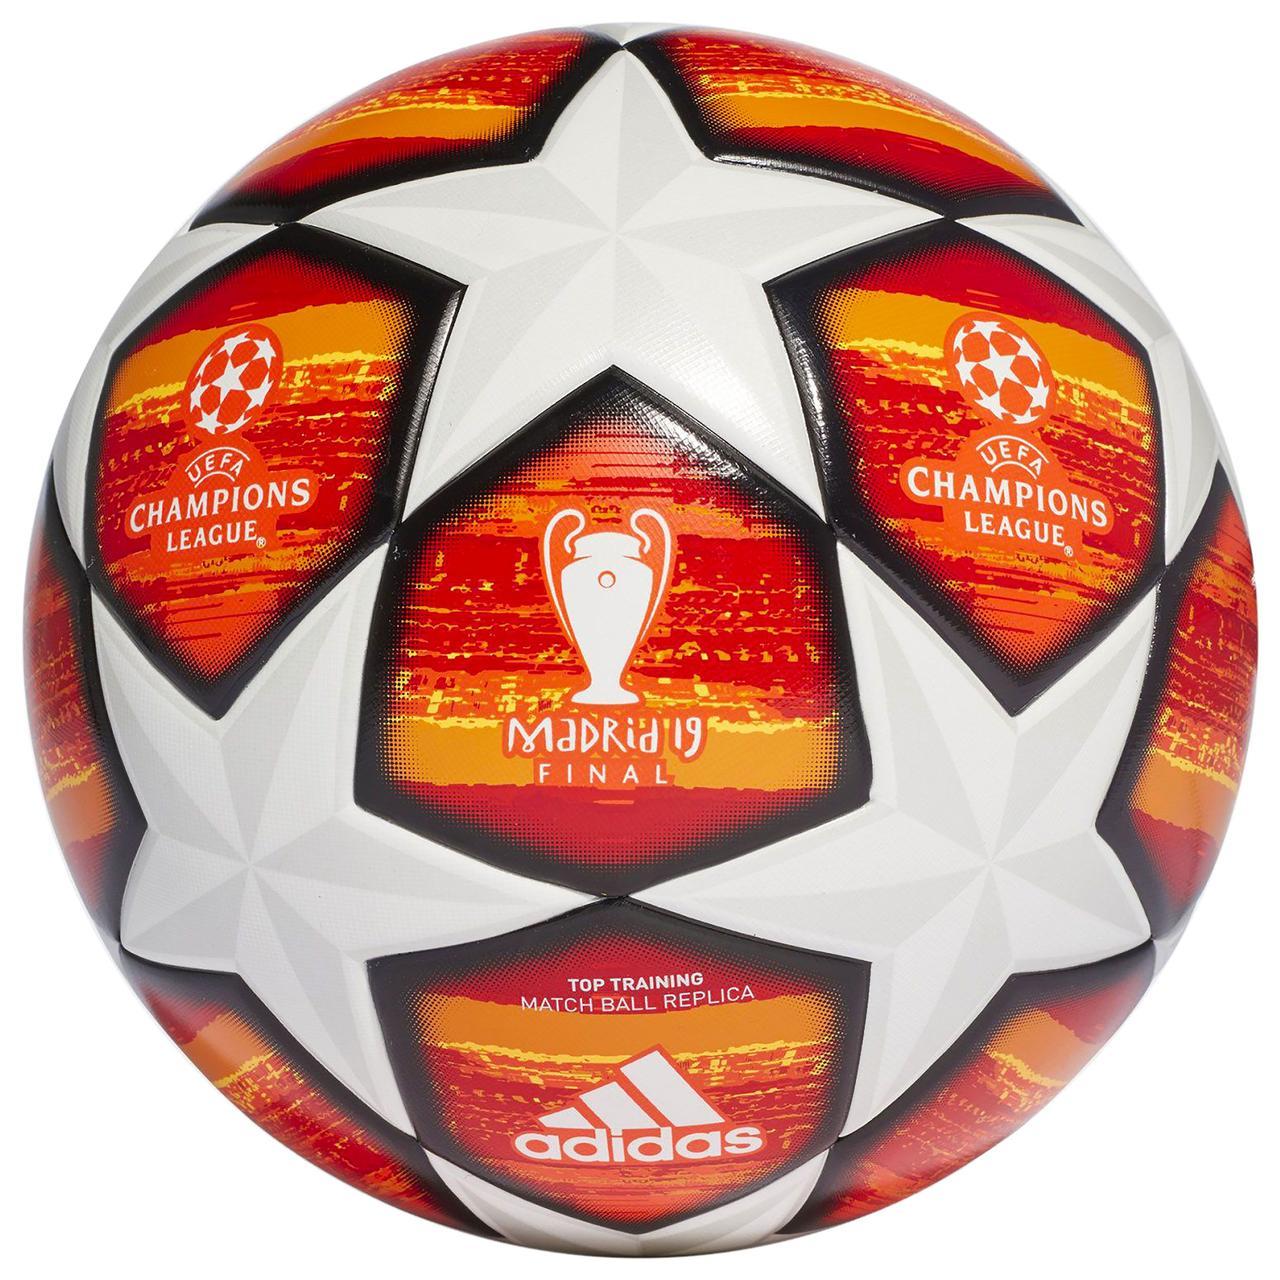 Мяч для футбола Adidas Finale Madrid 2019 (размер 5)